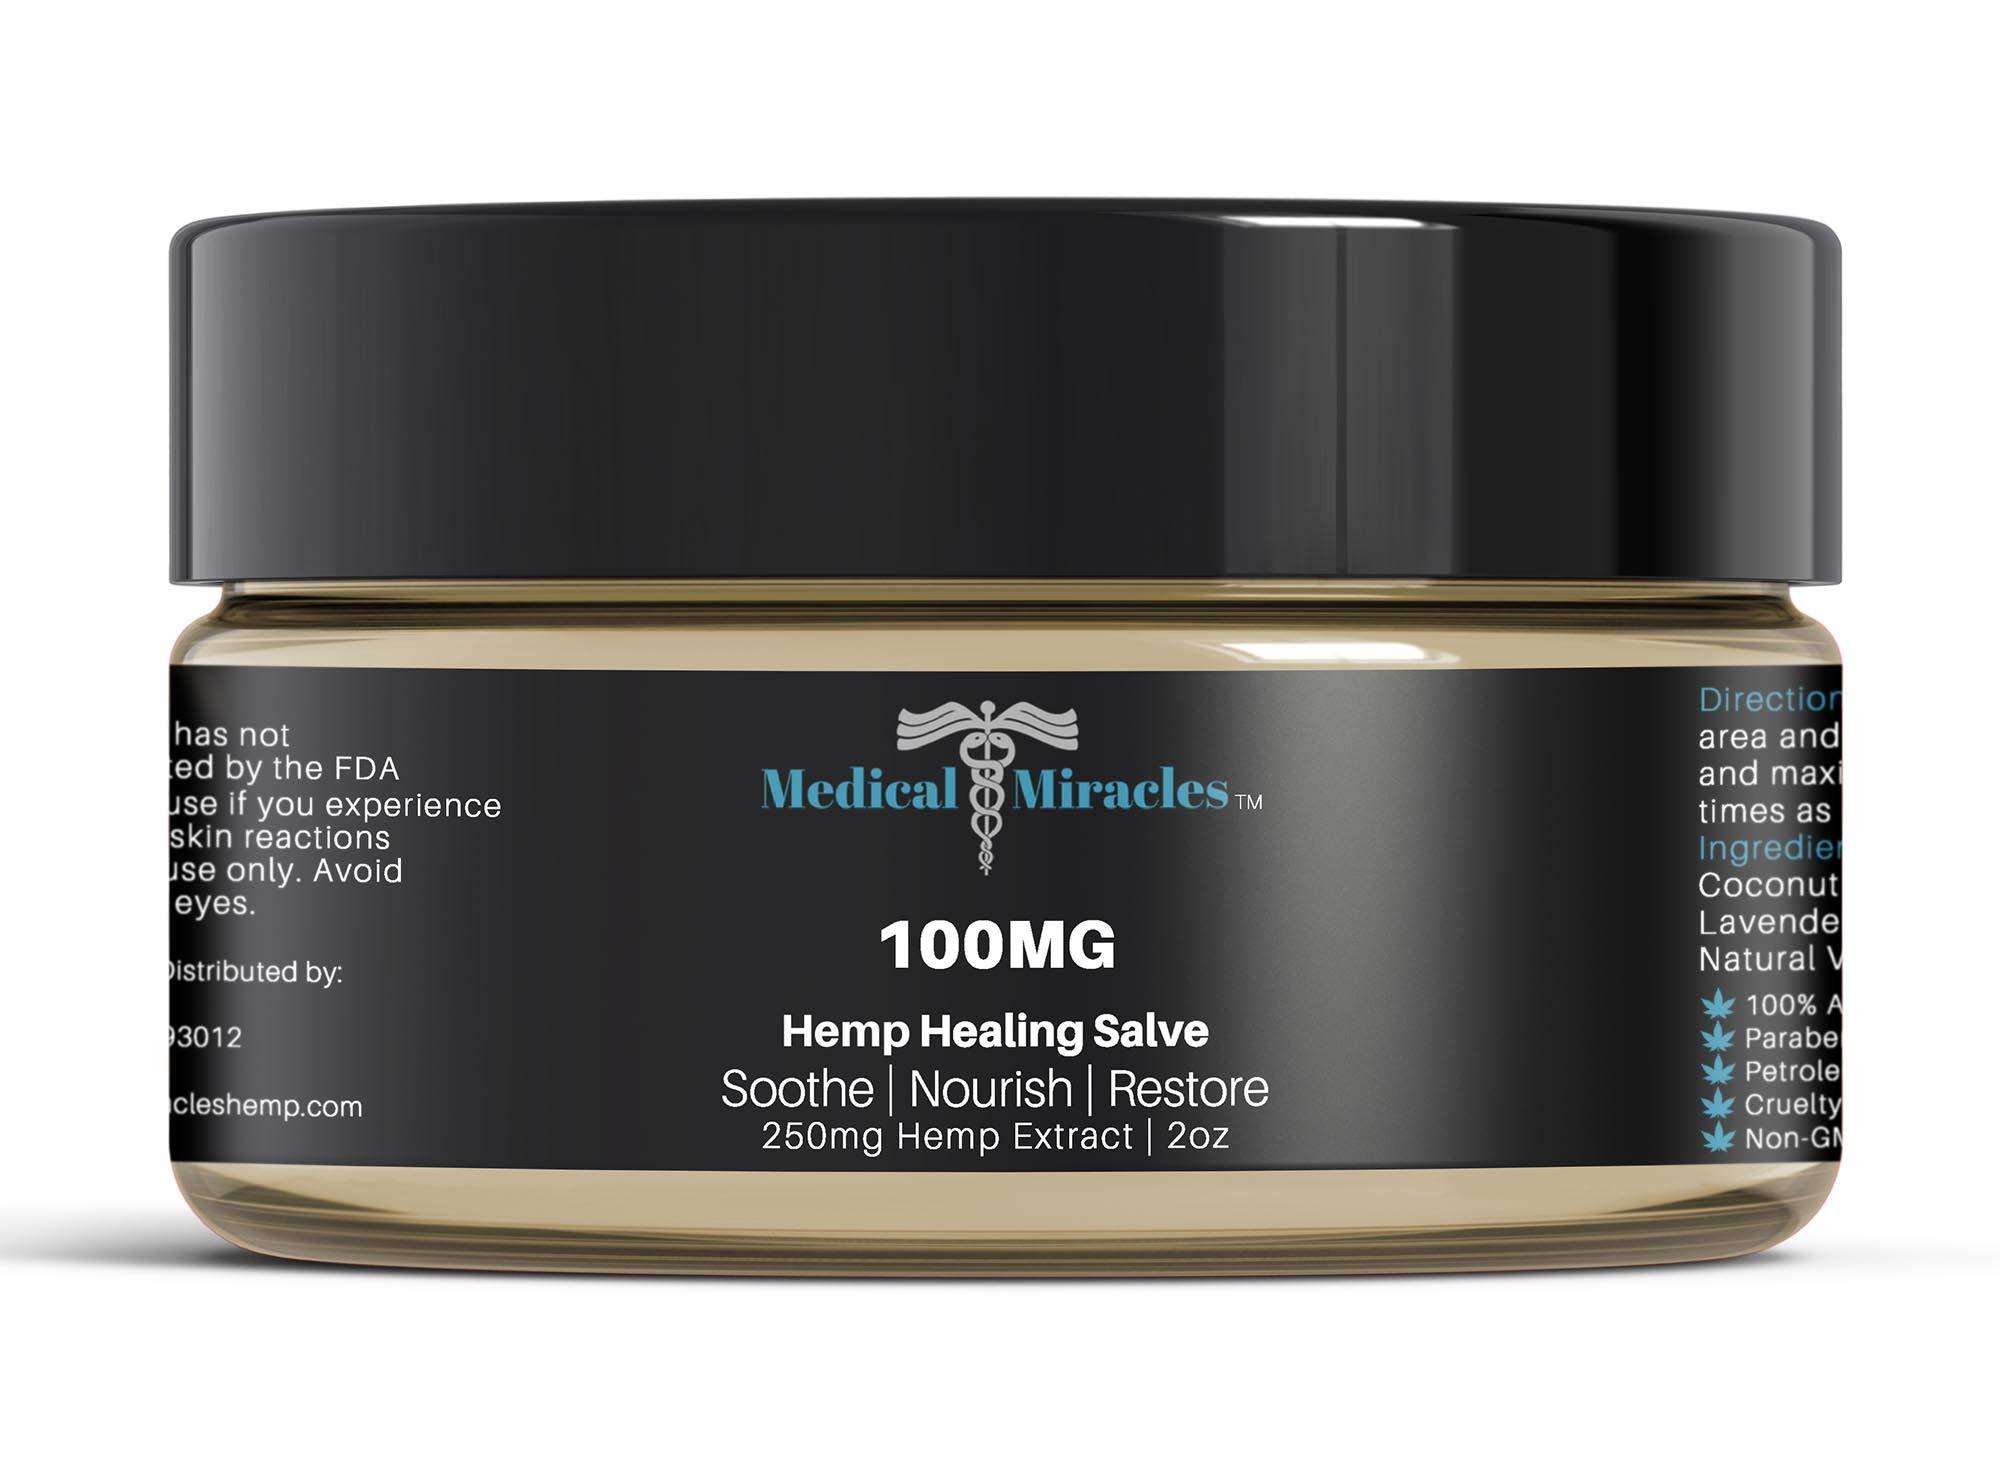 Medical Miracles Hemp 100 Mg Regular Strength Healing Hemp Salve, Relieves Inflammation, Muscle, Joint, Knee, Nerves, and Arthritis Pain. 100% Natural Cream